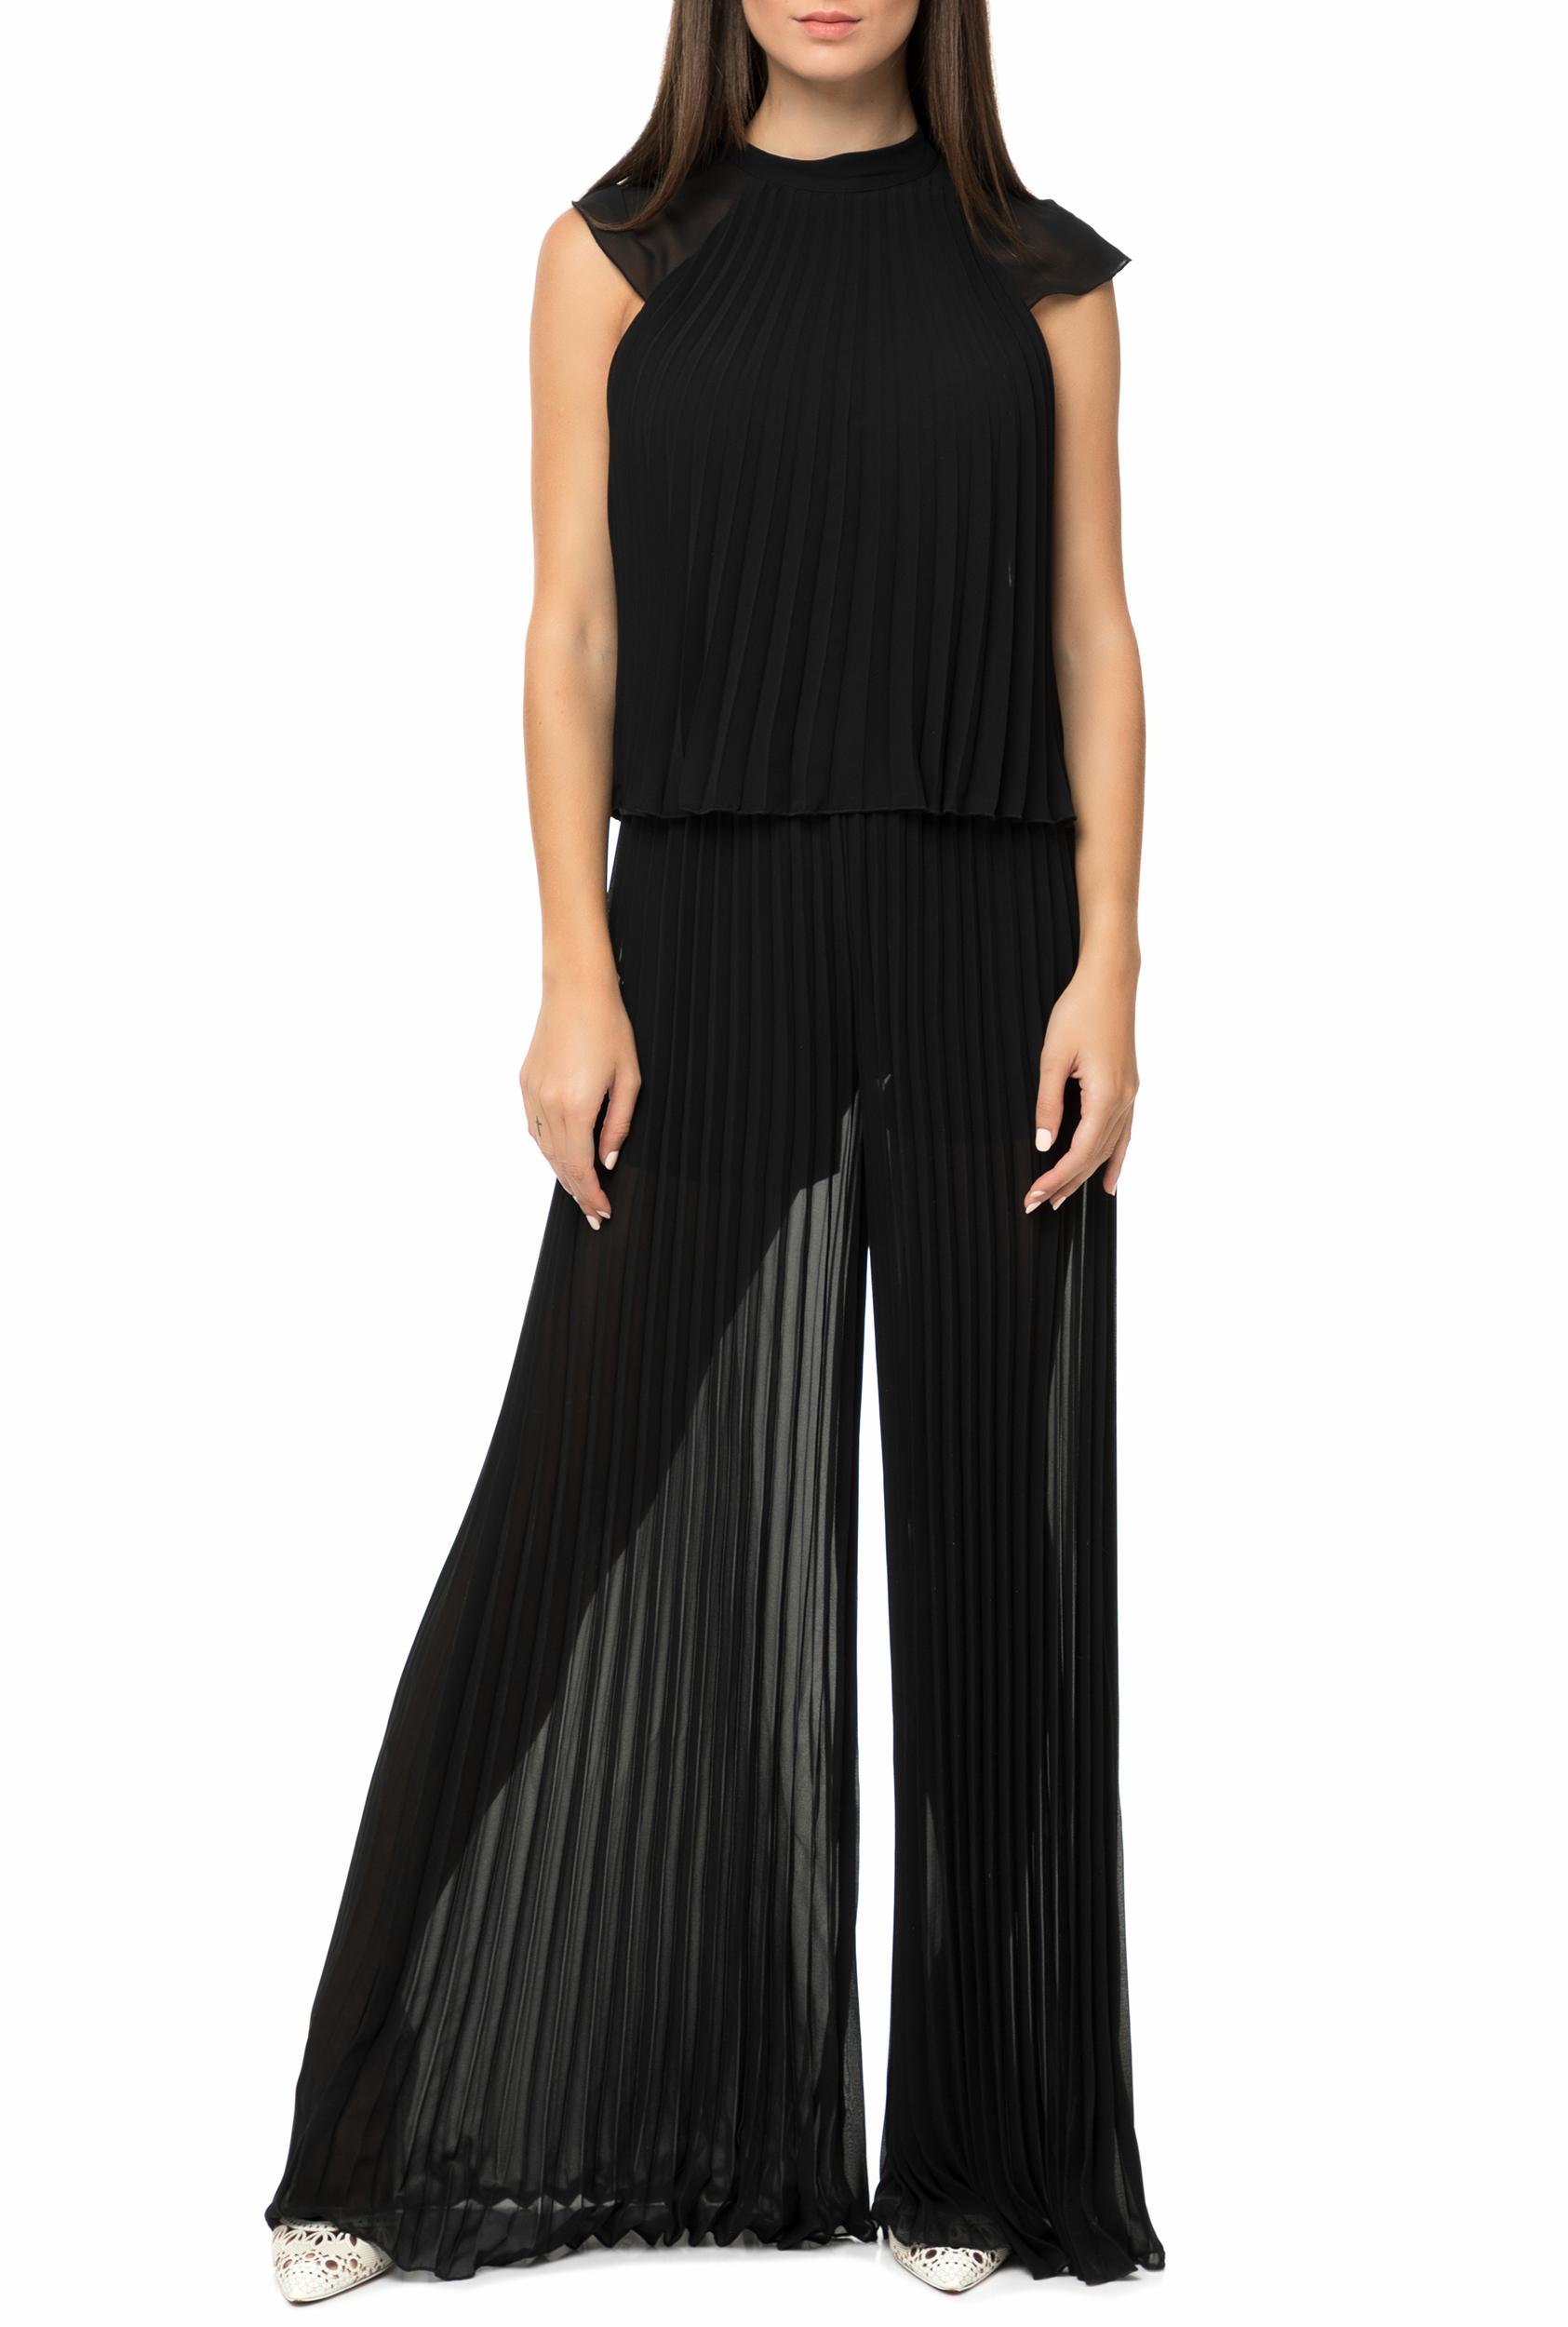 GUESS - Γυναικεία ολόσωμη φόρμα GUESS JUANITA μαύρη πλισέ b14517a7ec2